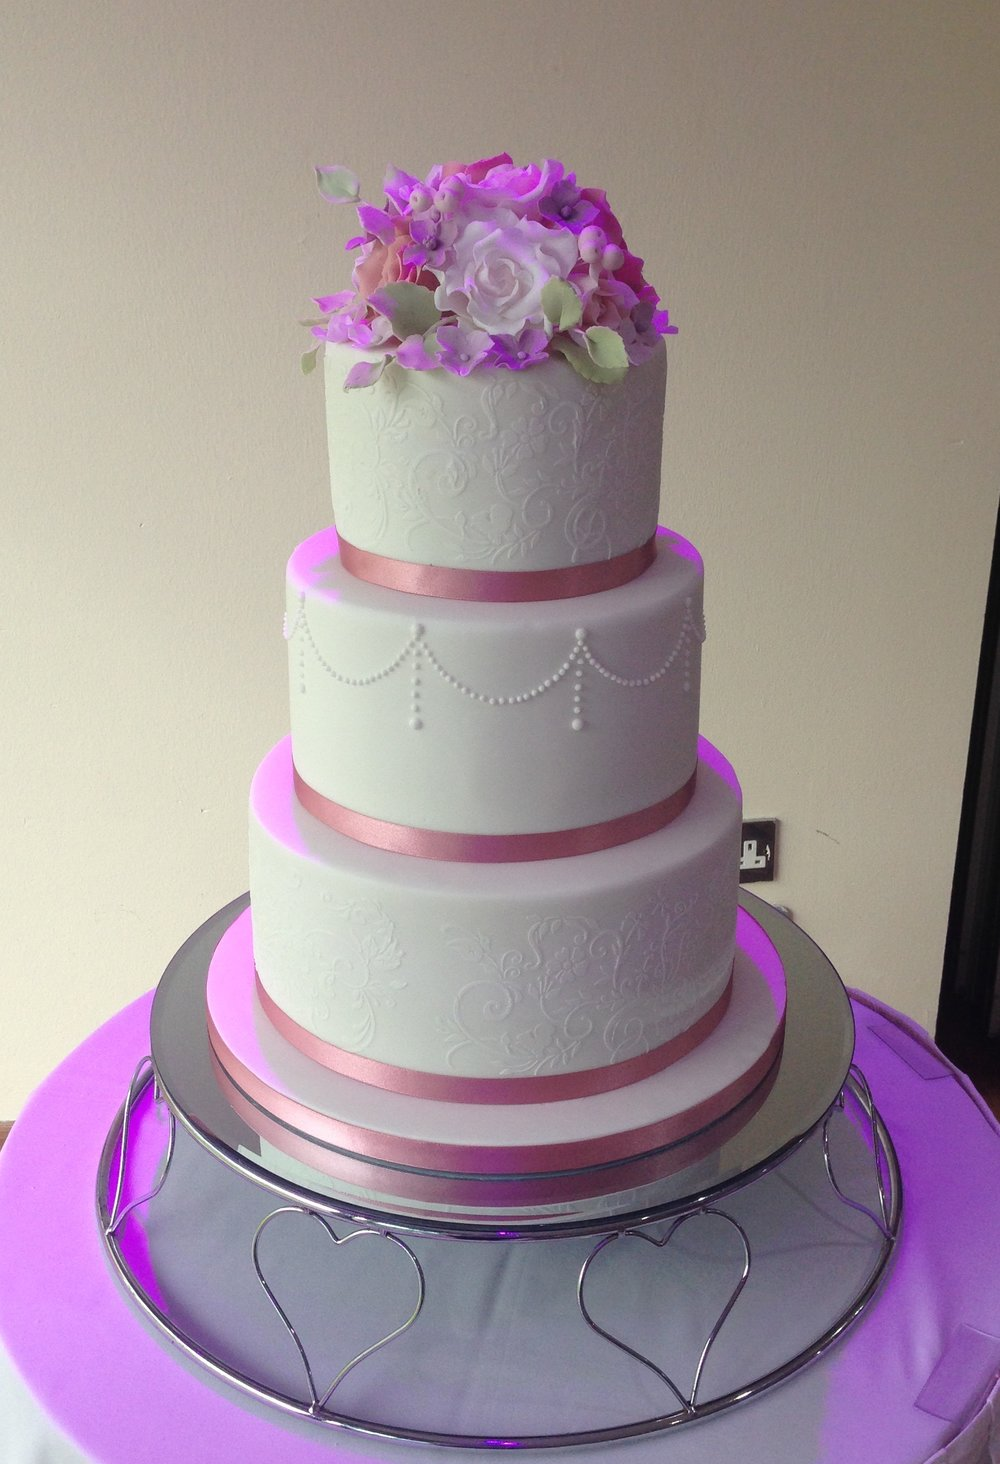 lace design wedding cake. Loren Brand Cakes